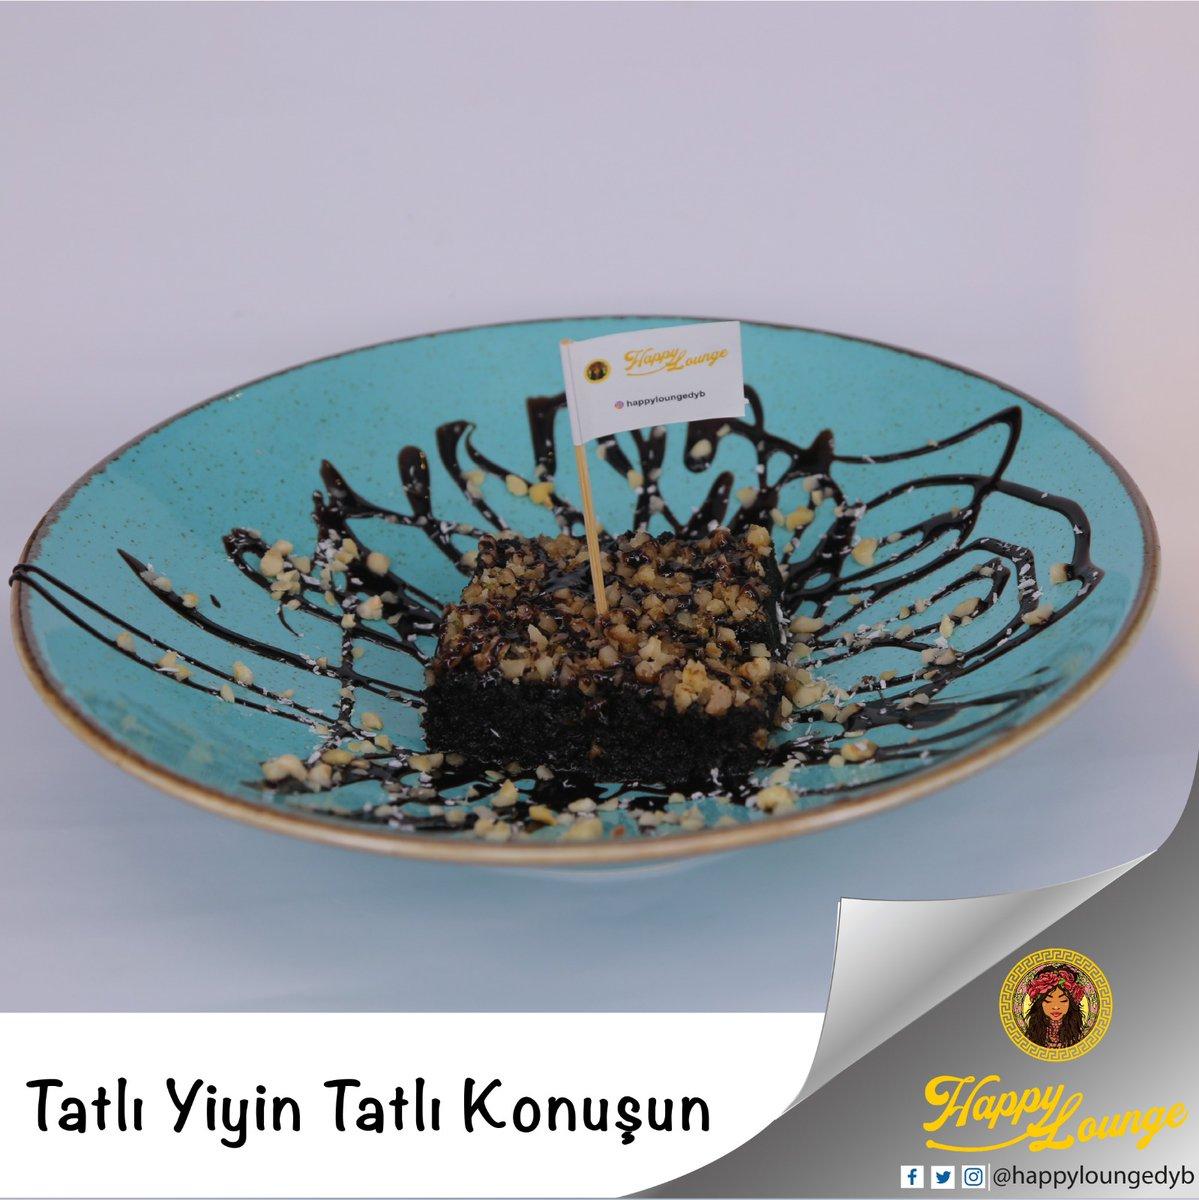 #happyloungedyb #happylounge #diyarbakır #kahvaltı #cafe #nargile #lounge #happy #falafel #yemek #food #franchise